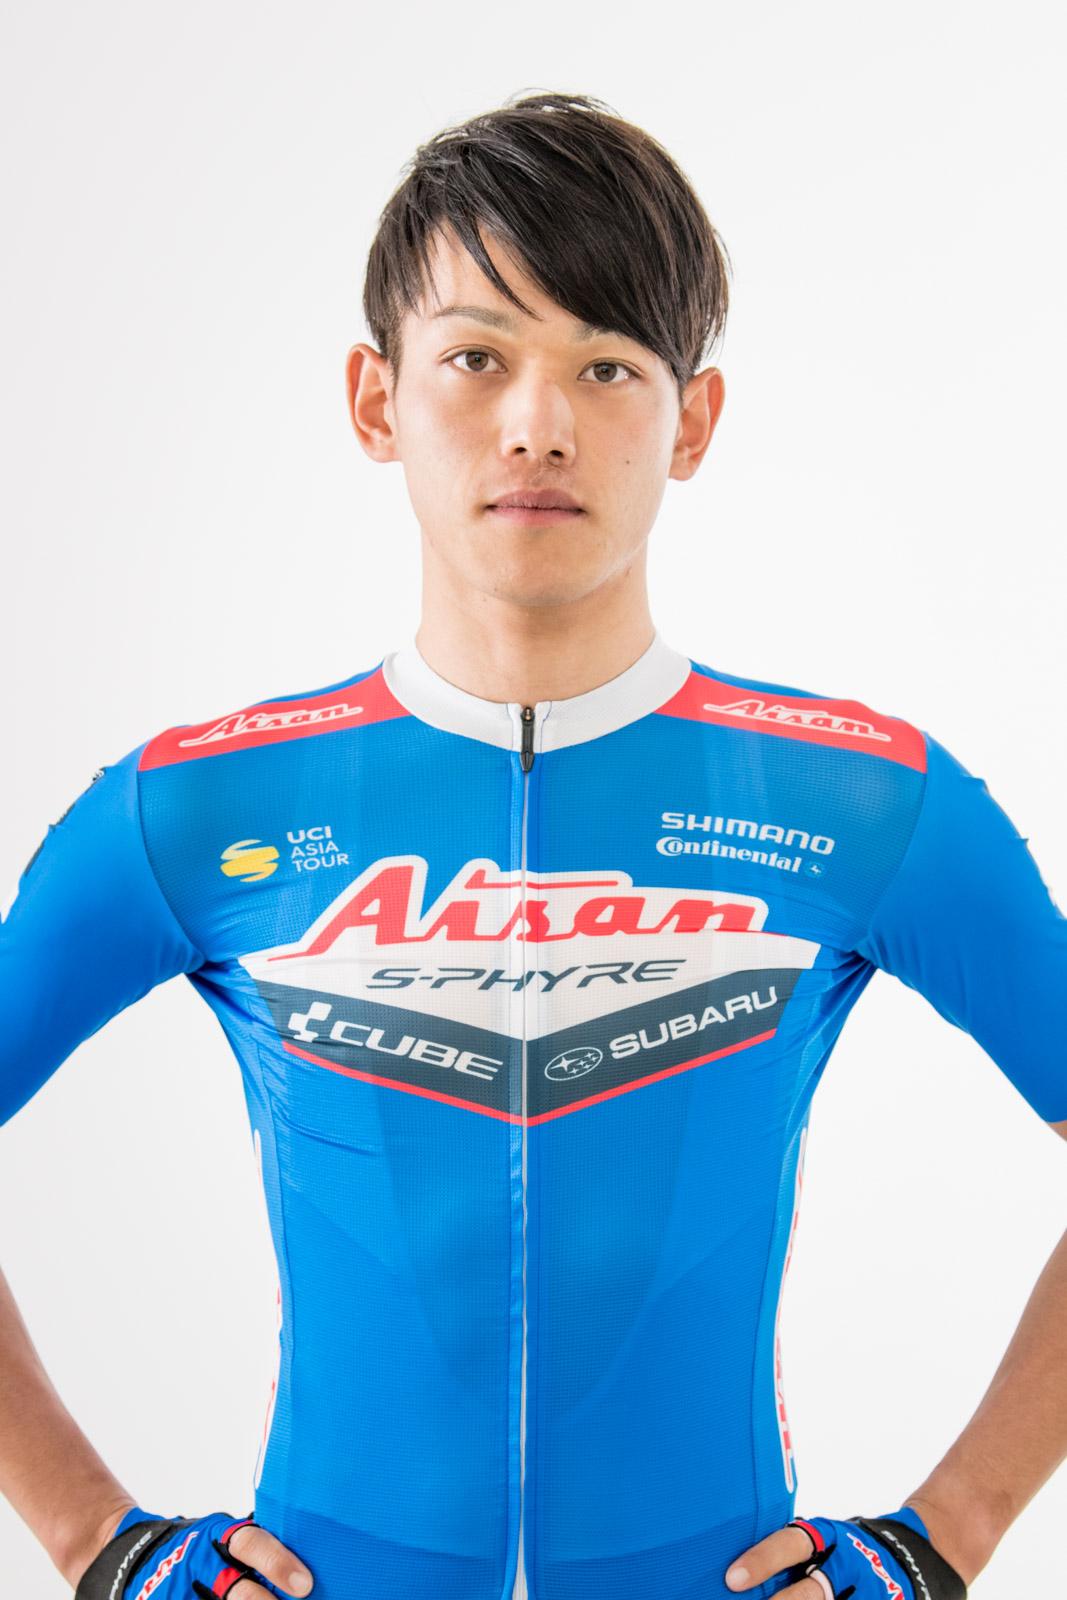 18 Aso Keisuke.jpg